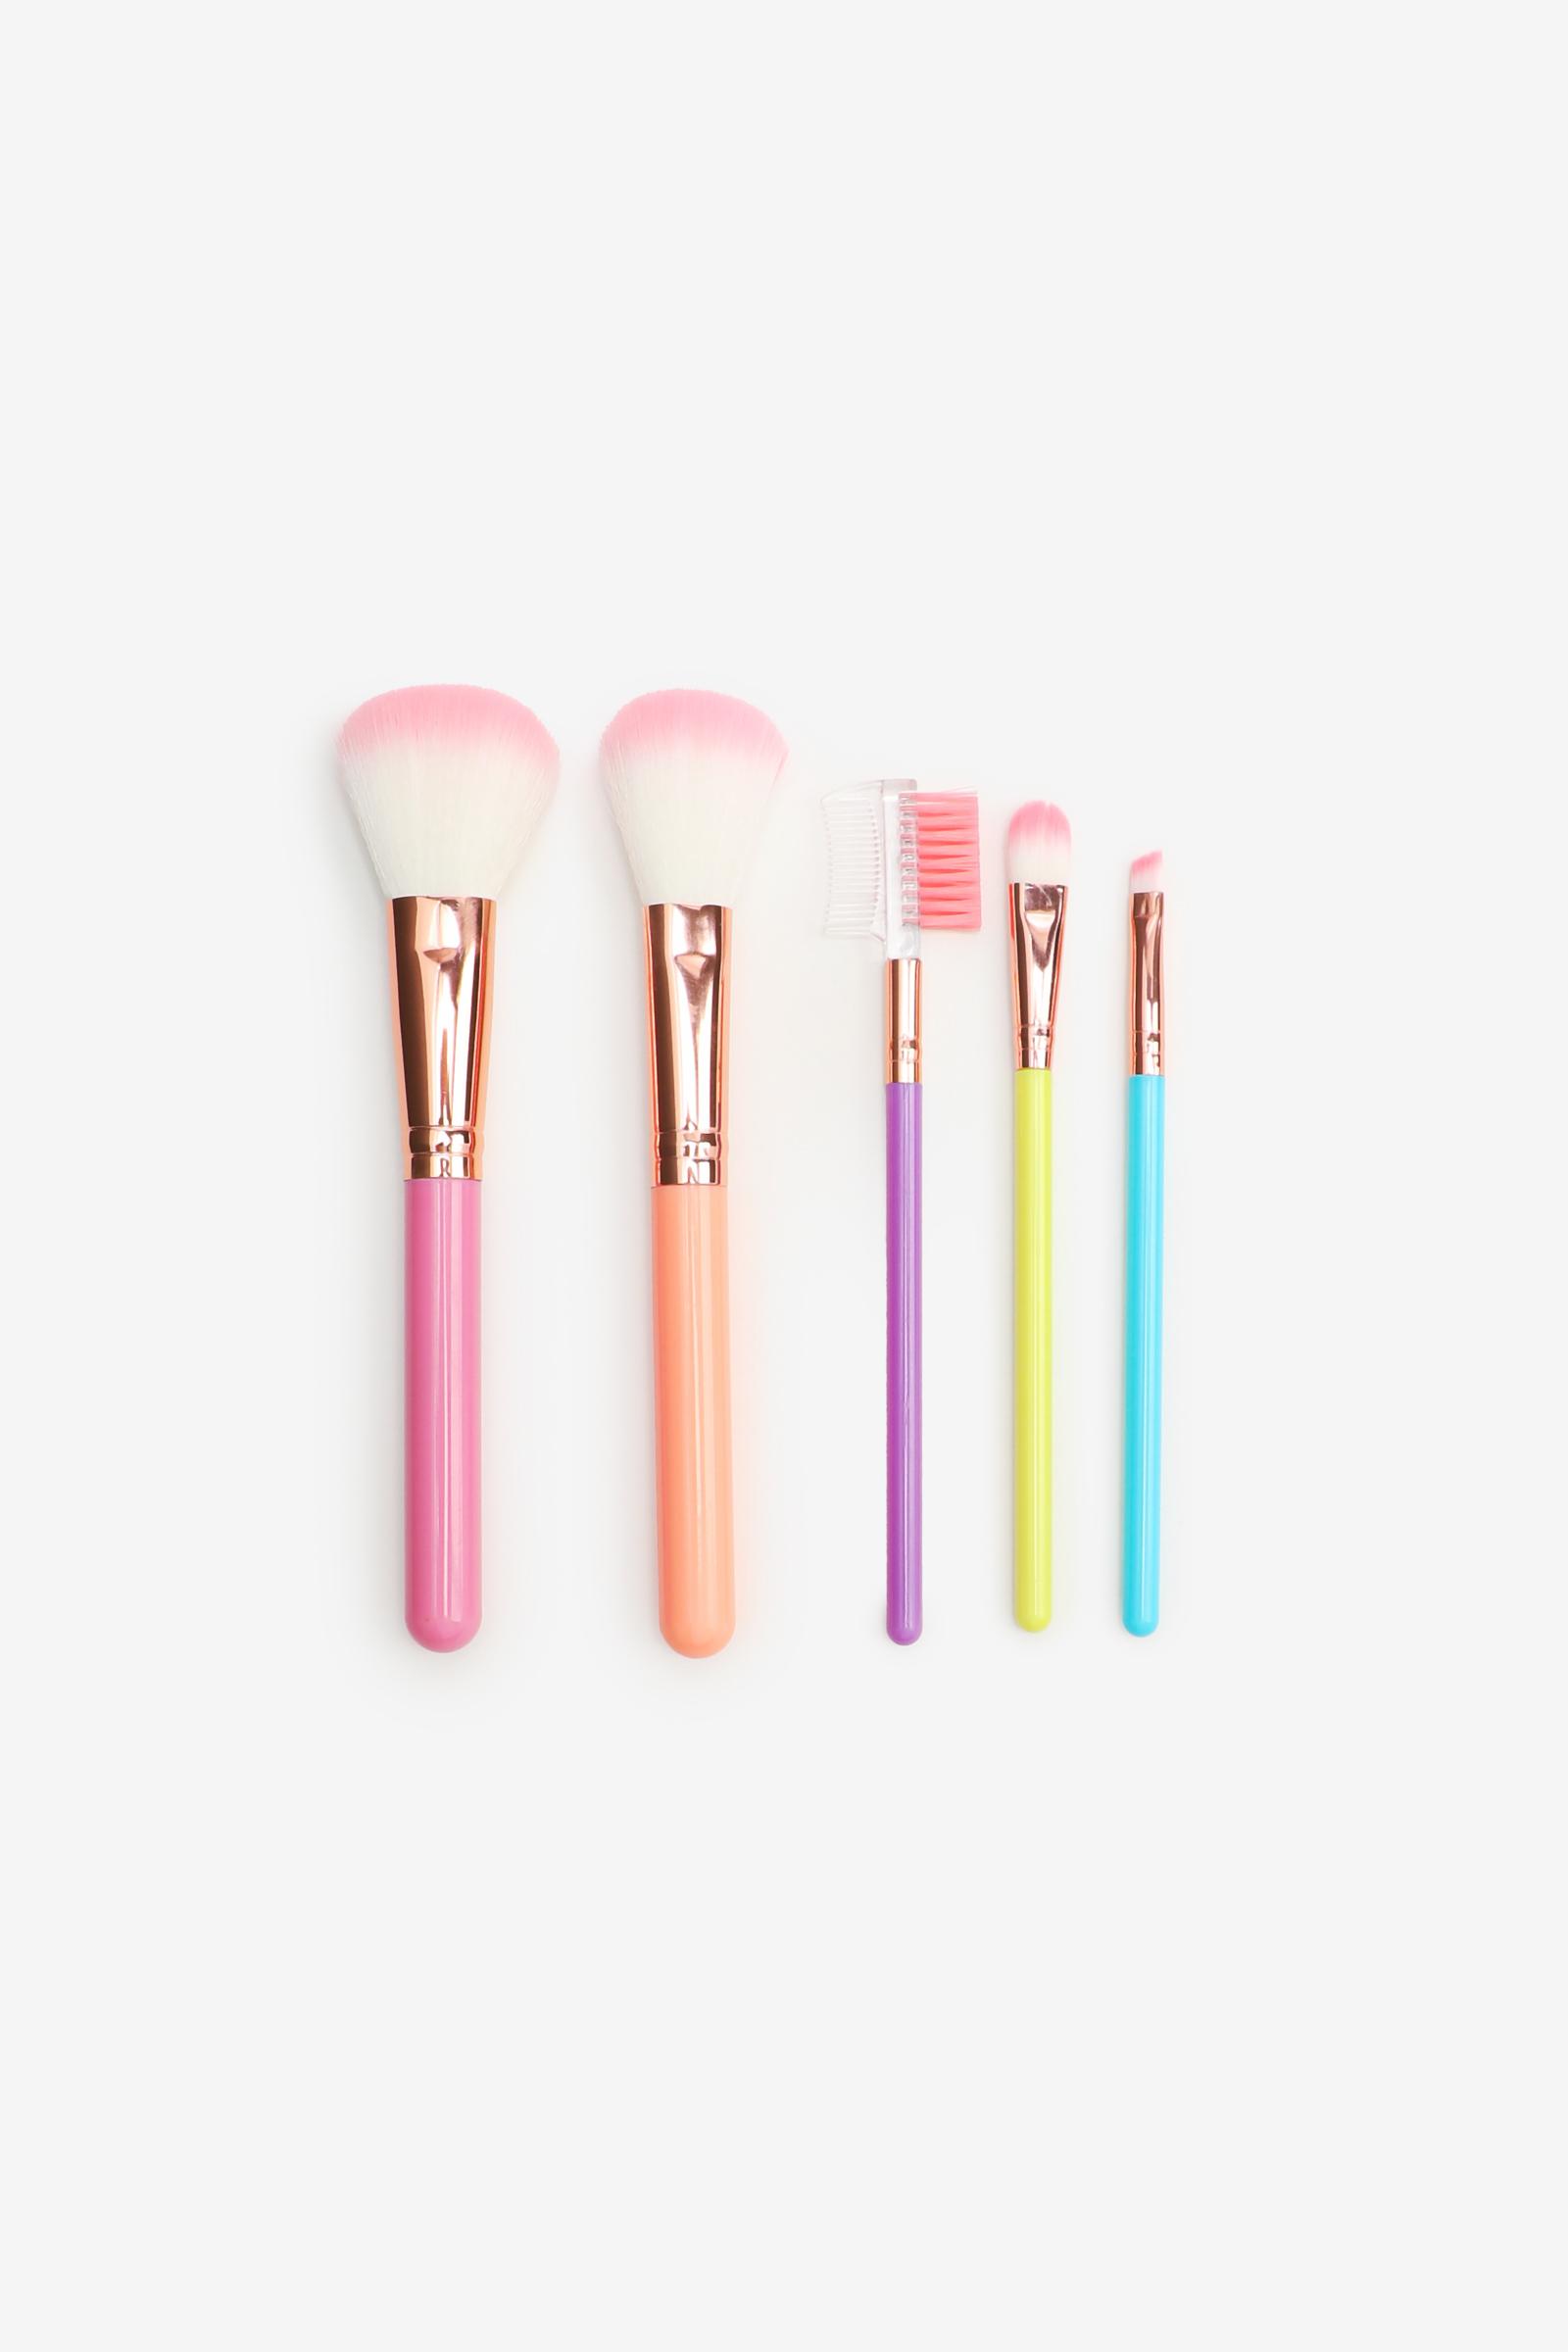 5-Pack of Makeup Brush Sets